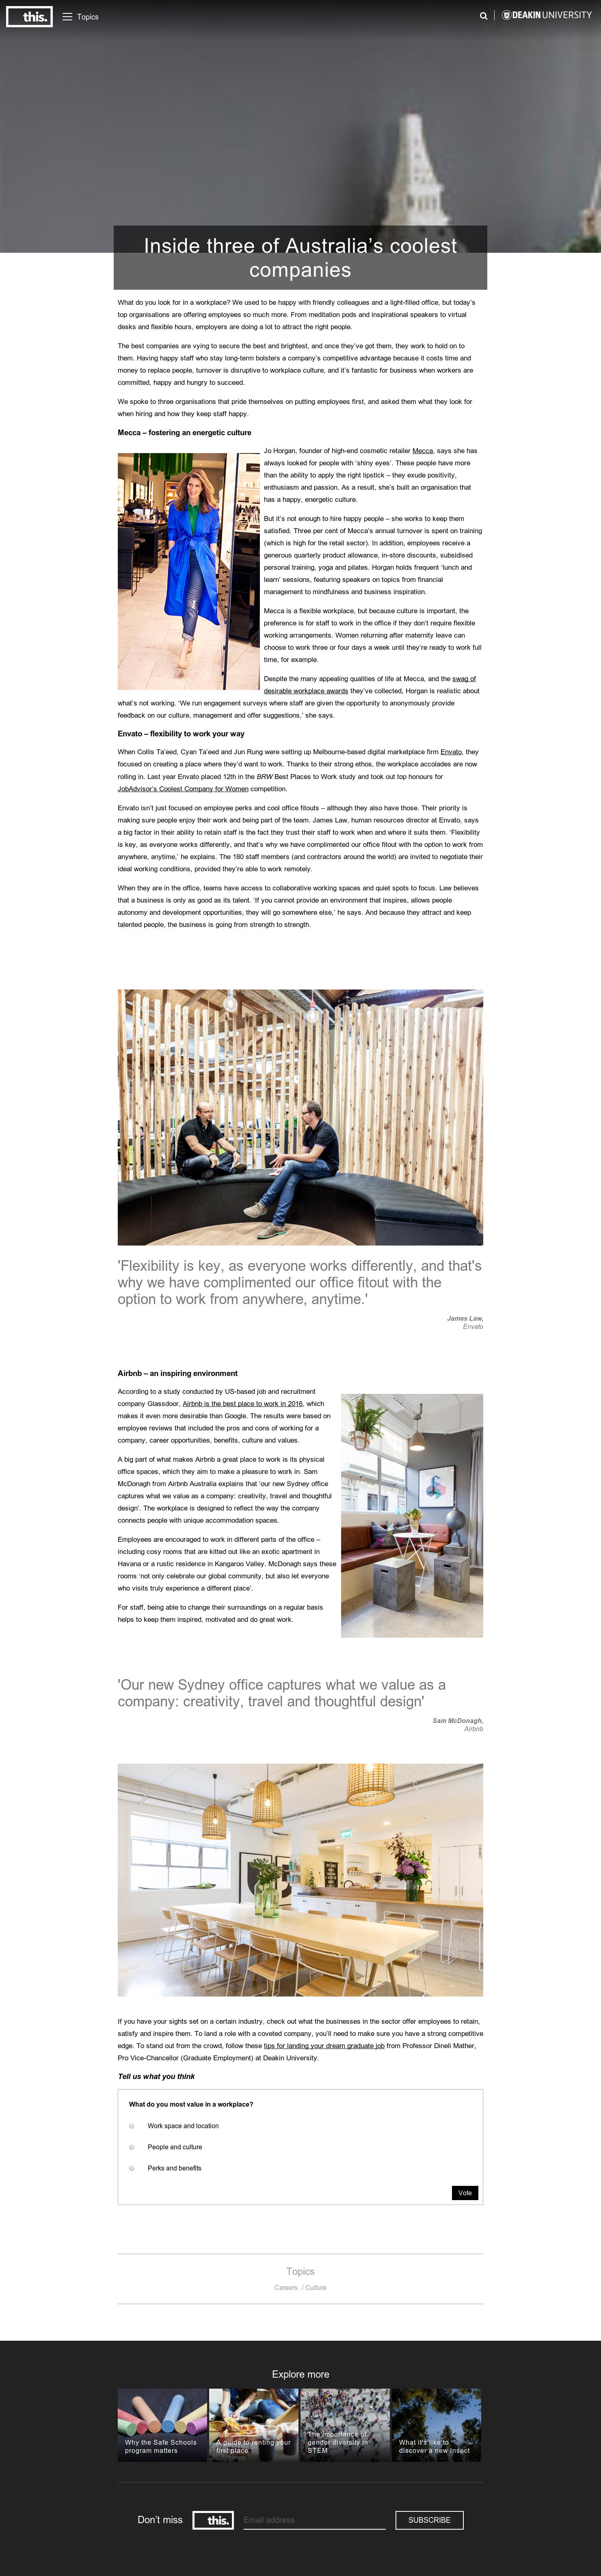 Inside three of Australia's coolest companies - This (Deakin University)